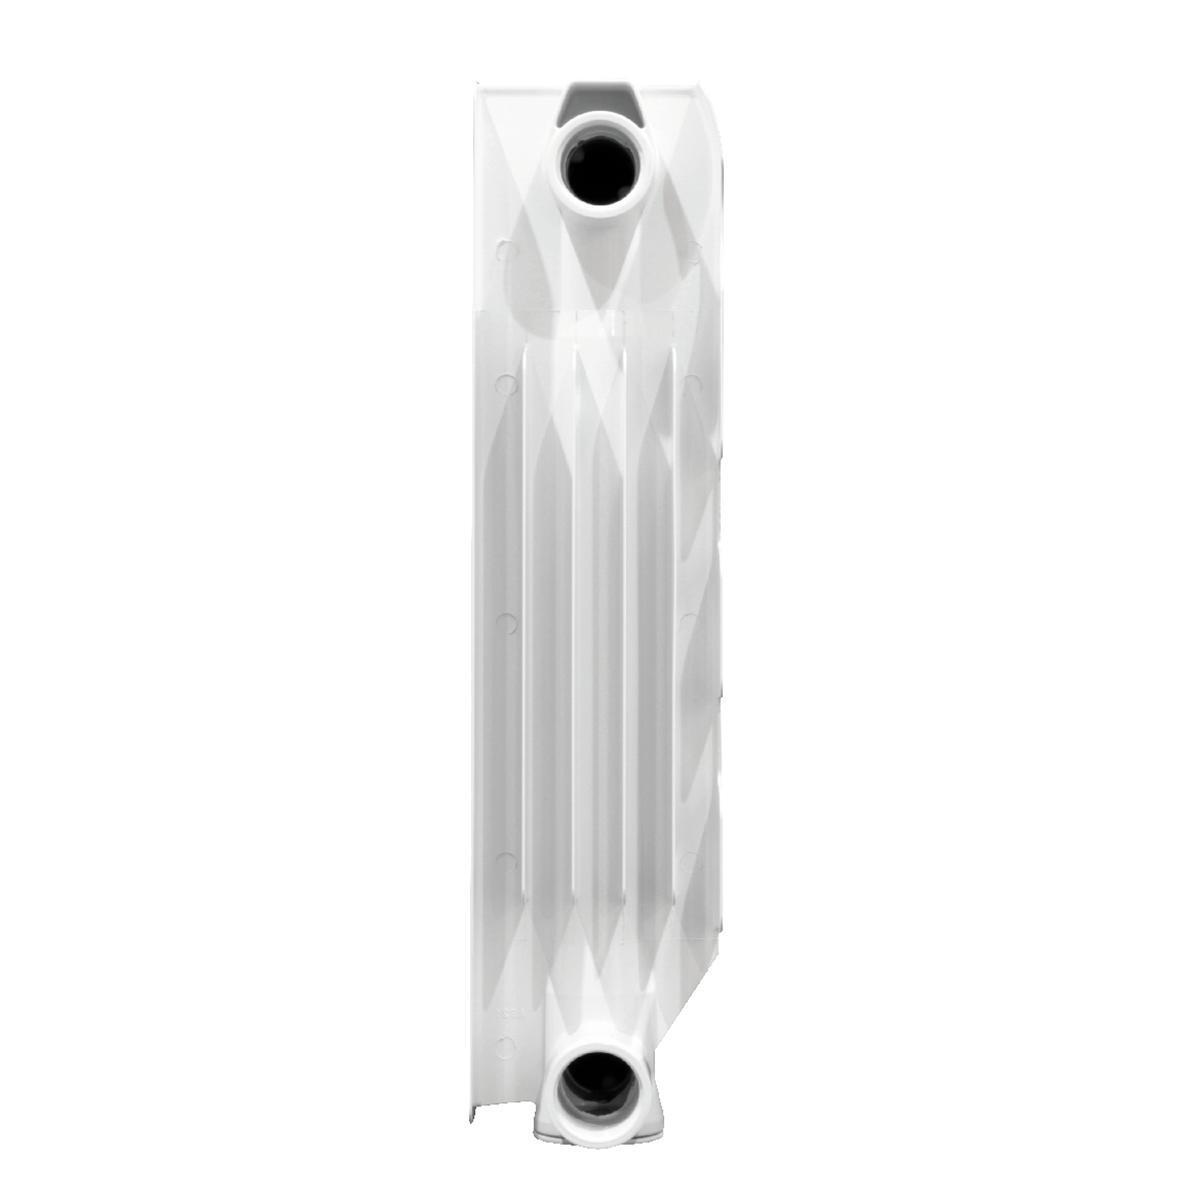 Radiatore acqua calda PRODIGE Modern in alluminio 10 elementi interasse 35 cm - 2